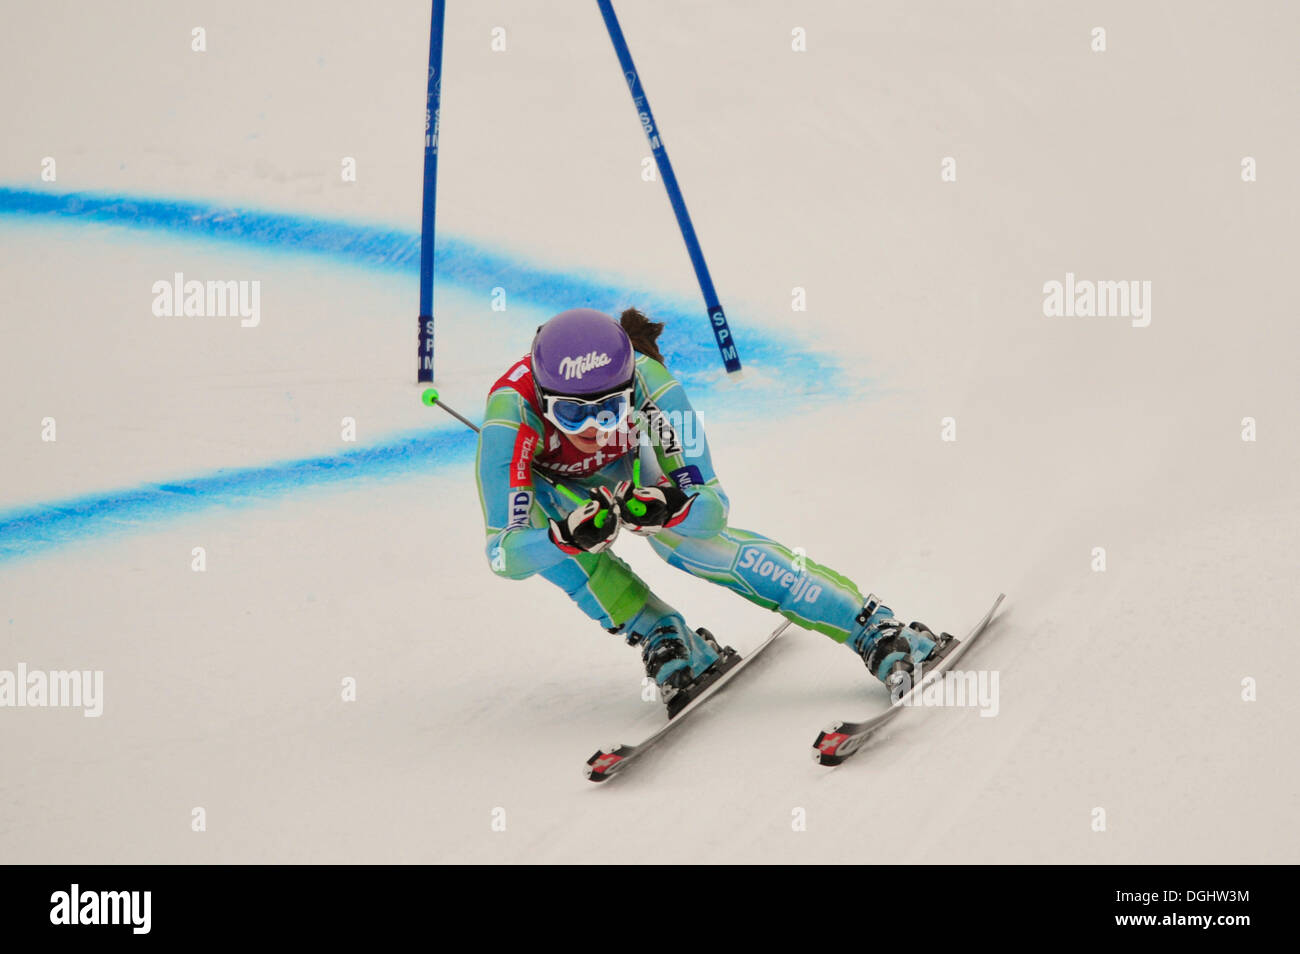 Tina Maze, Slovenia, Ski World Cup, Garmisch-Partenkirchen, Bavaria - Stock Image